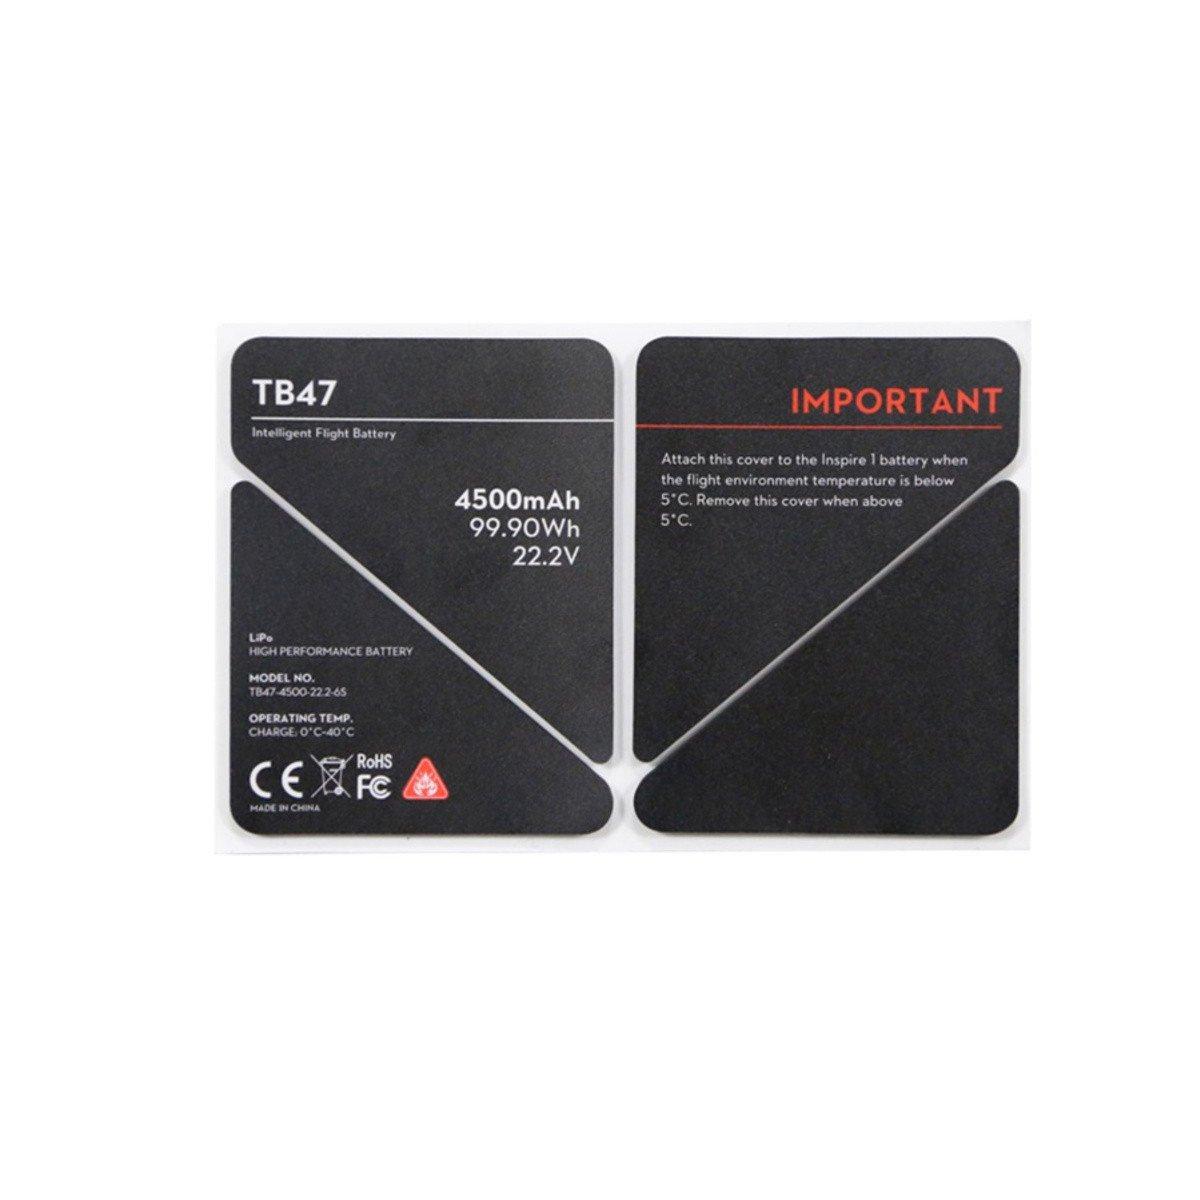 Inspire 1 – TB47 Battery Insulation Sticker